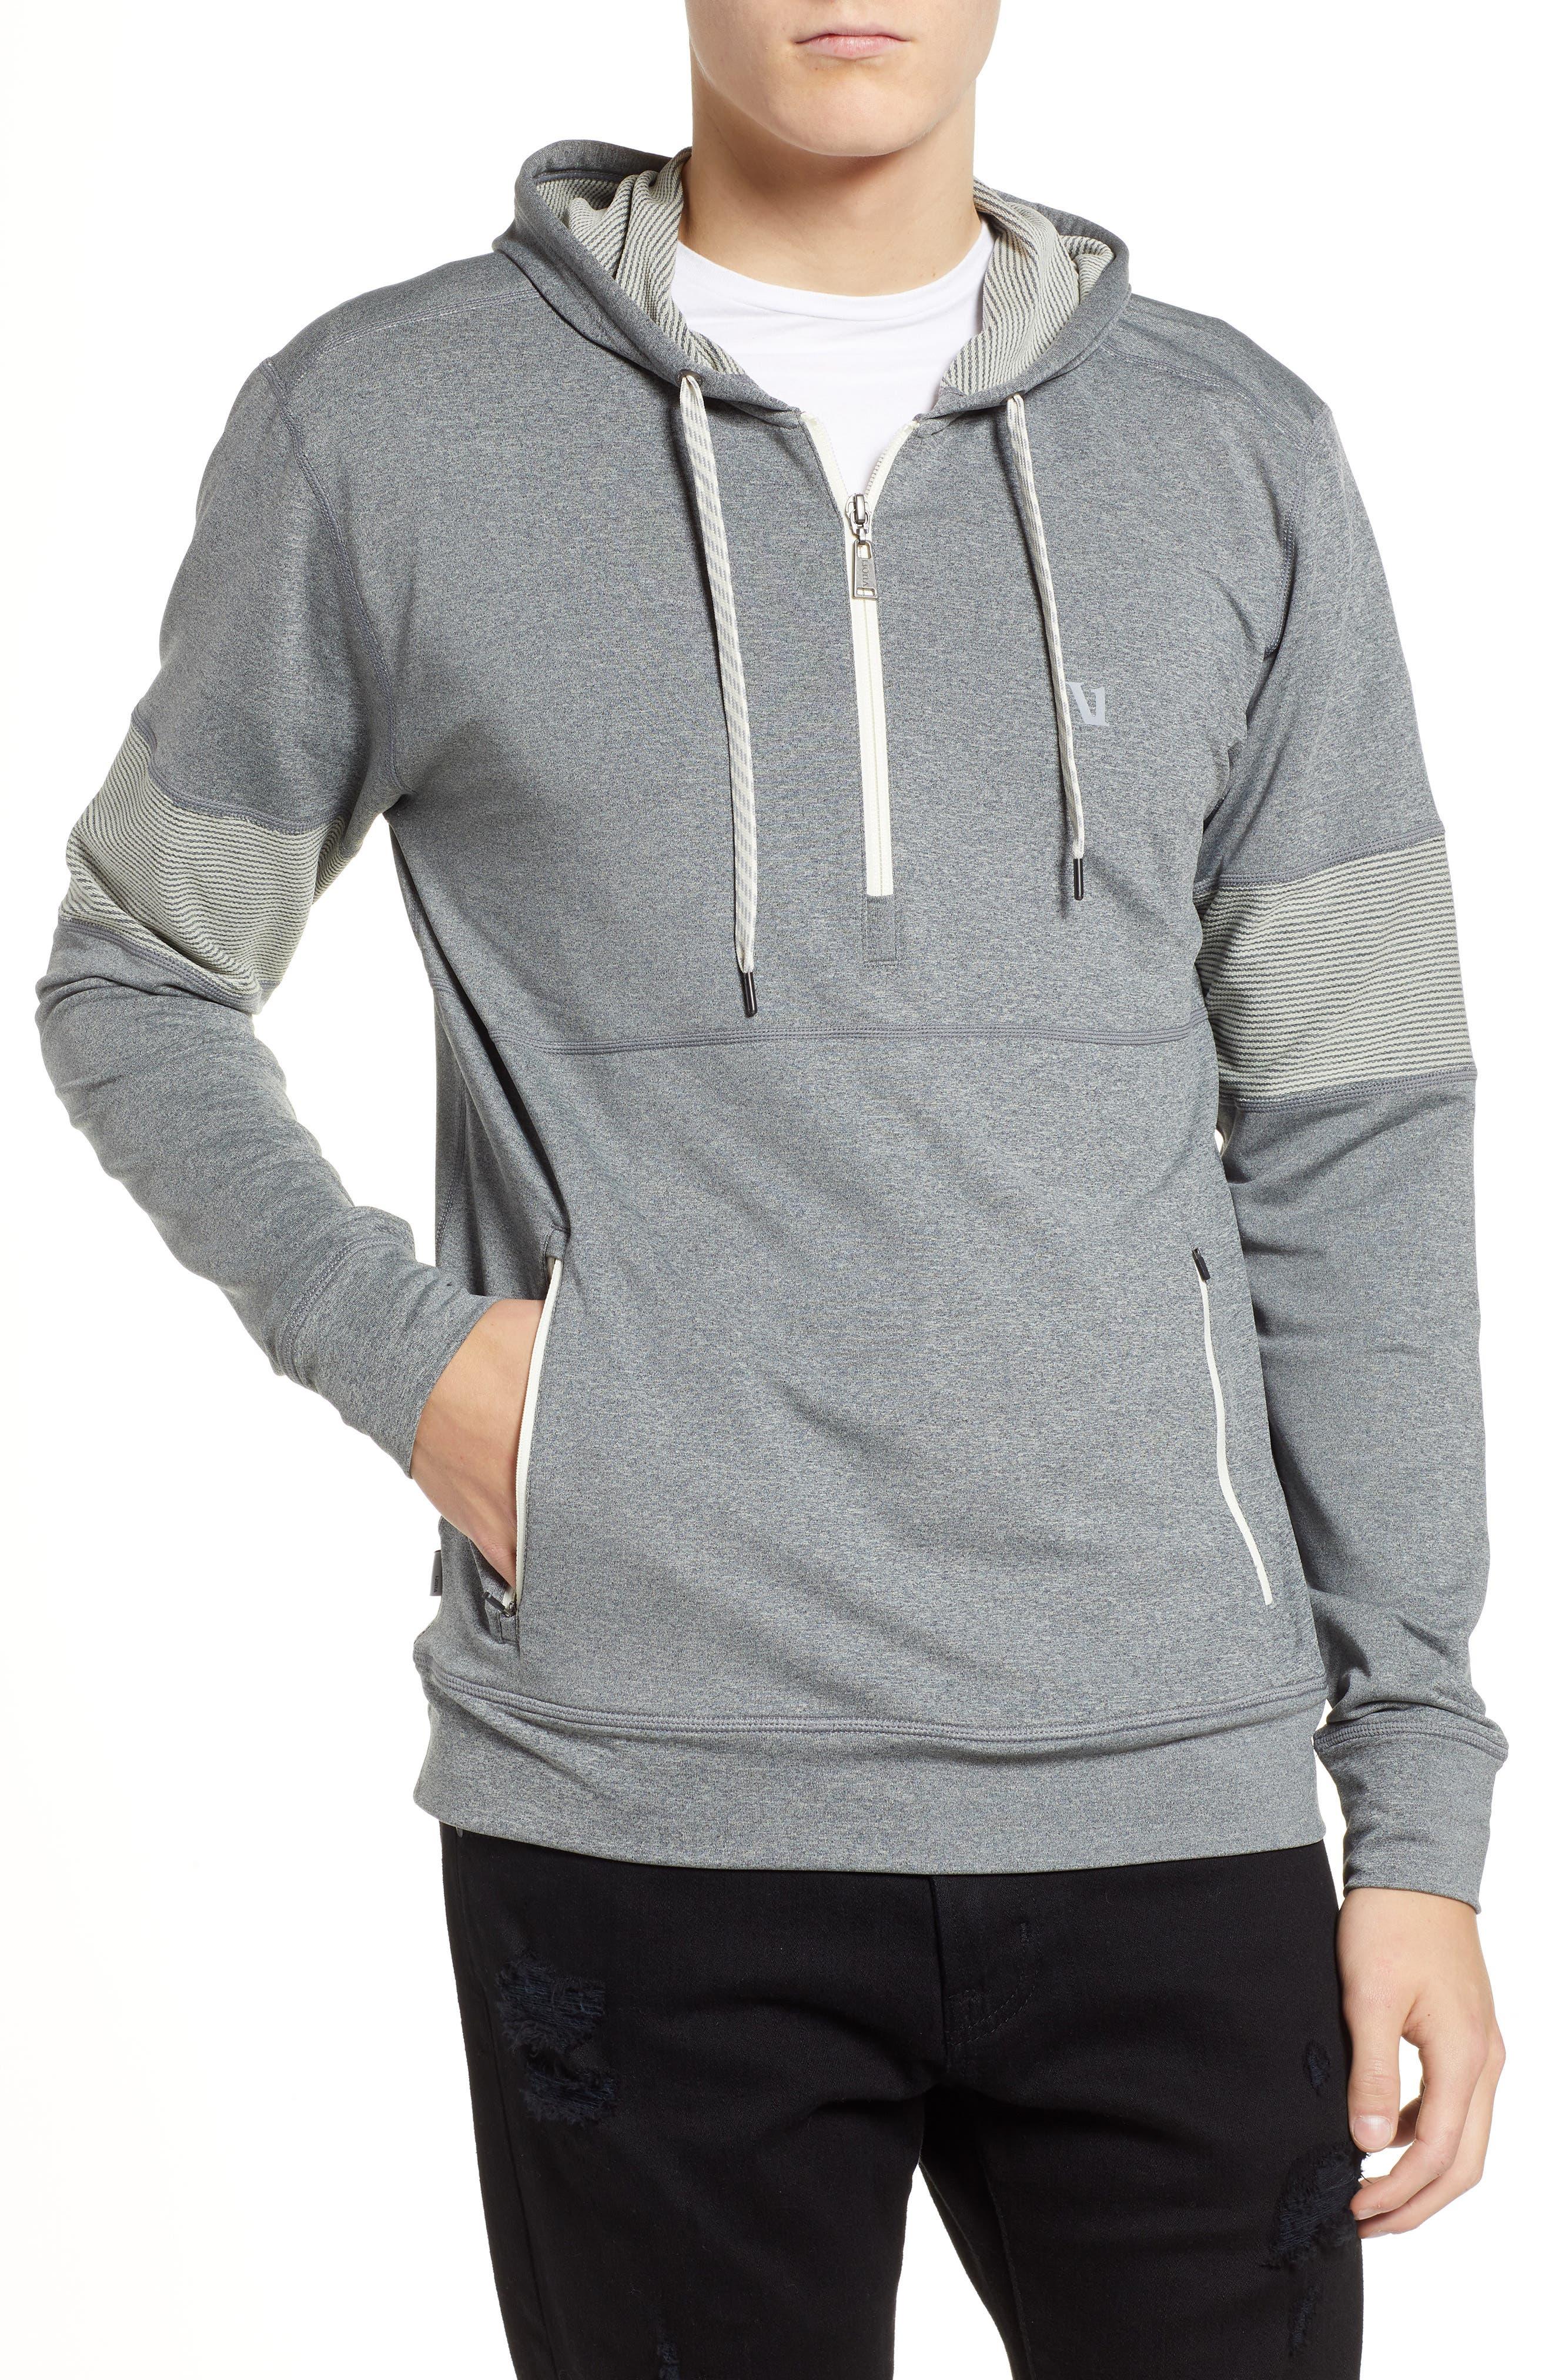 Zion Half Zip Pullover Hoodie,                         Main,                         color, HEATHER GREY